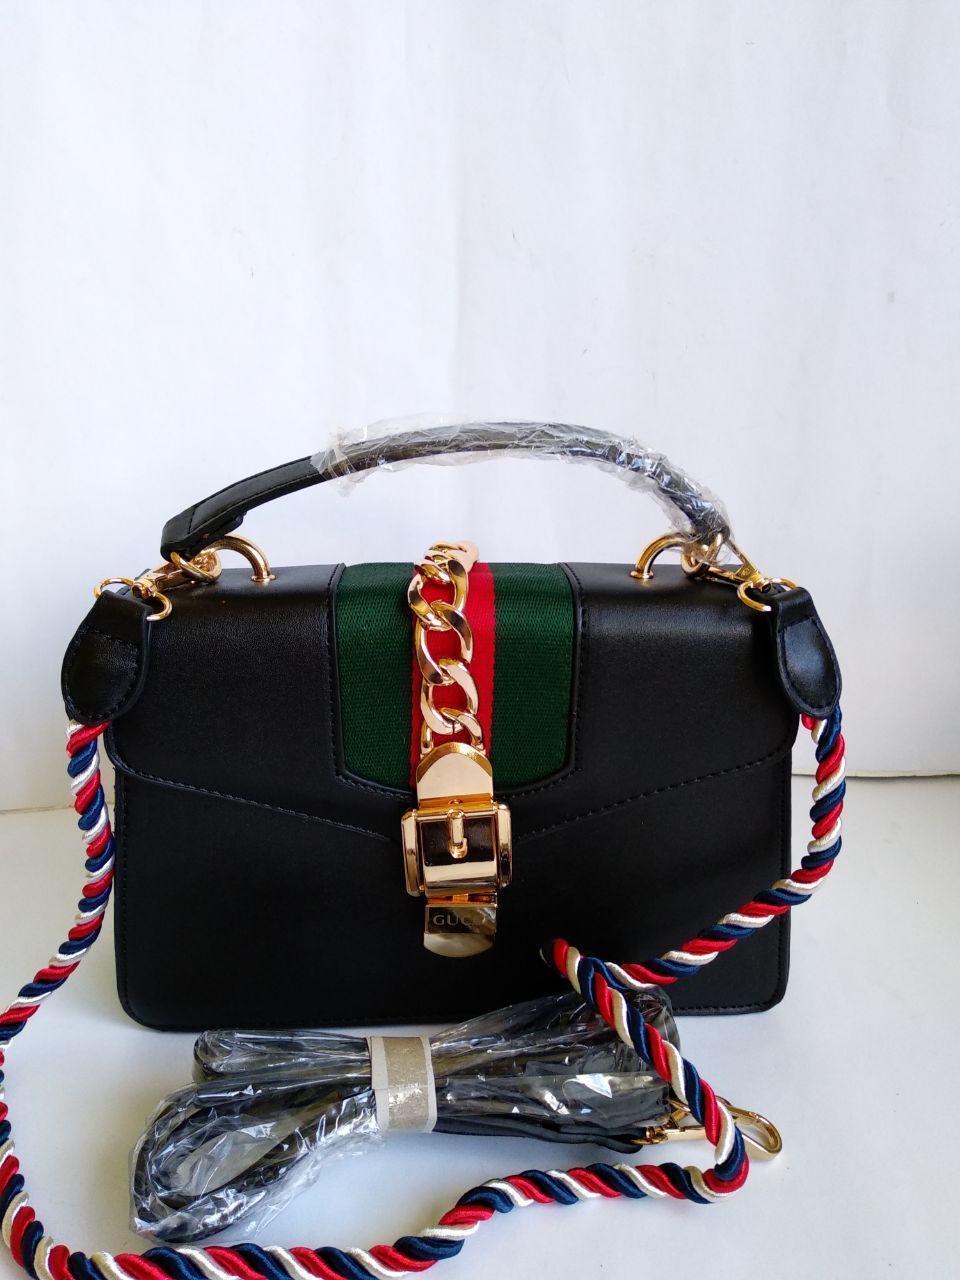 beda54399cd5 Женская Черная Сумка-клатч в Стиле Gucci Гуччи — в Категории